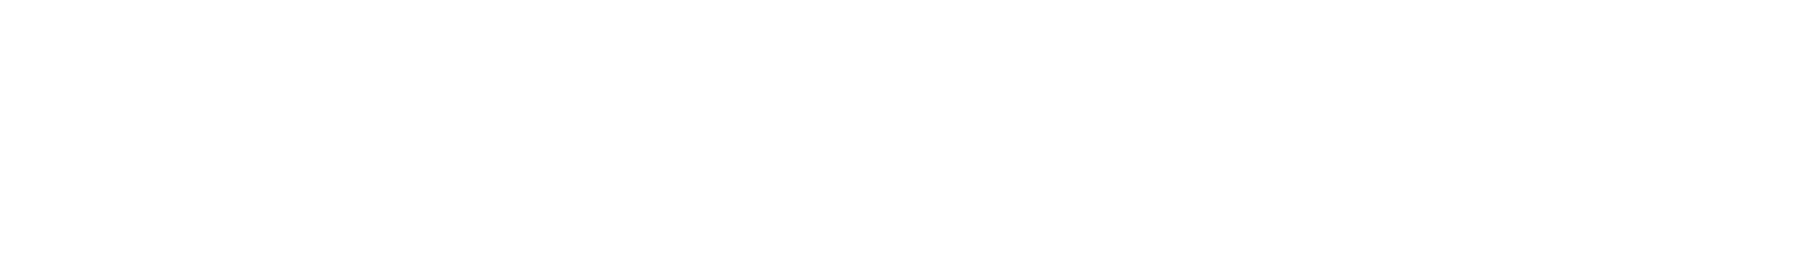 ehu liveperc128 002